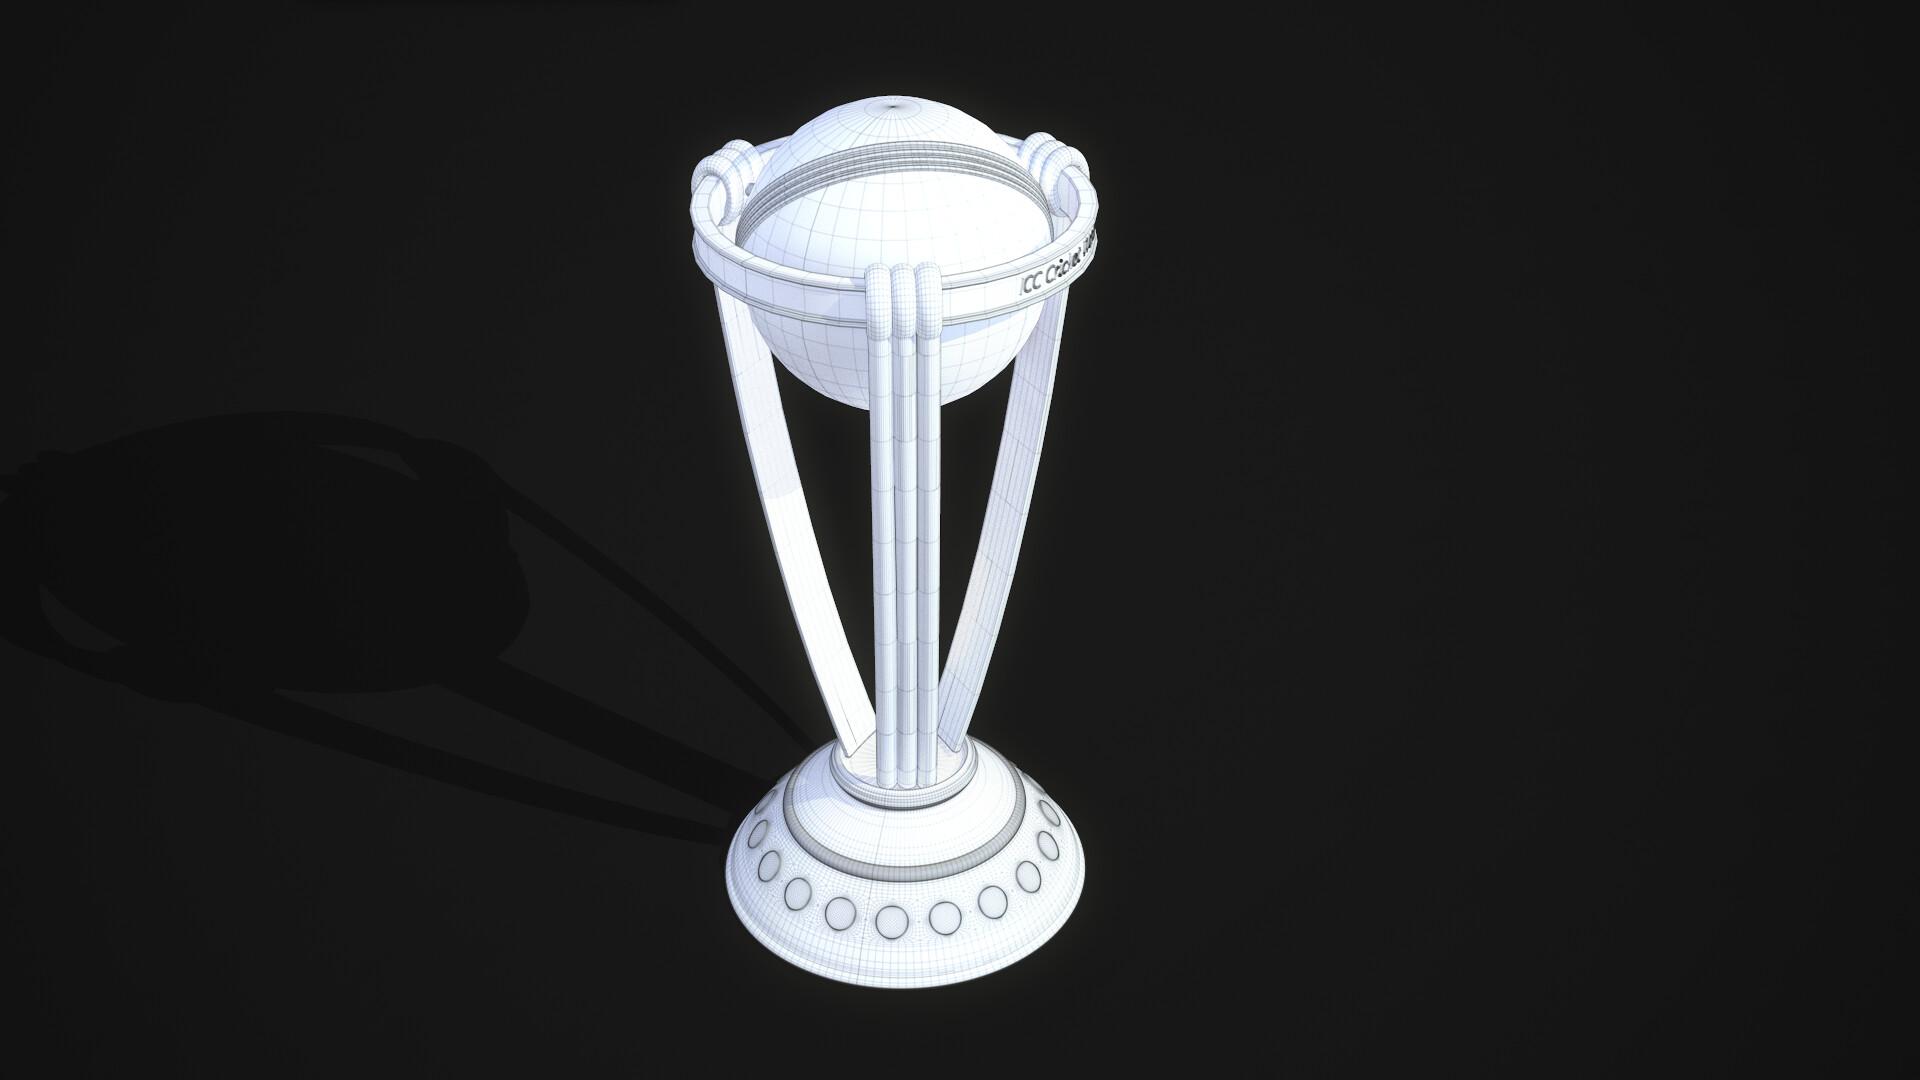 Hashib Hossain - ICC World Cup Cricket Trophy 3D Model